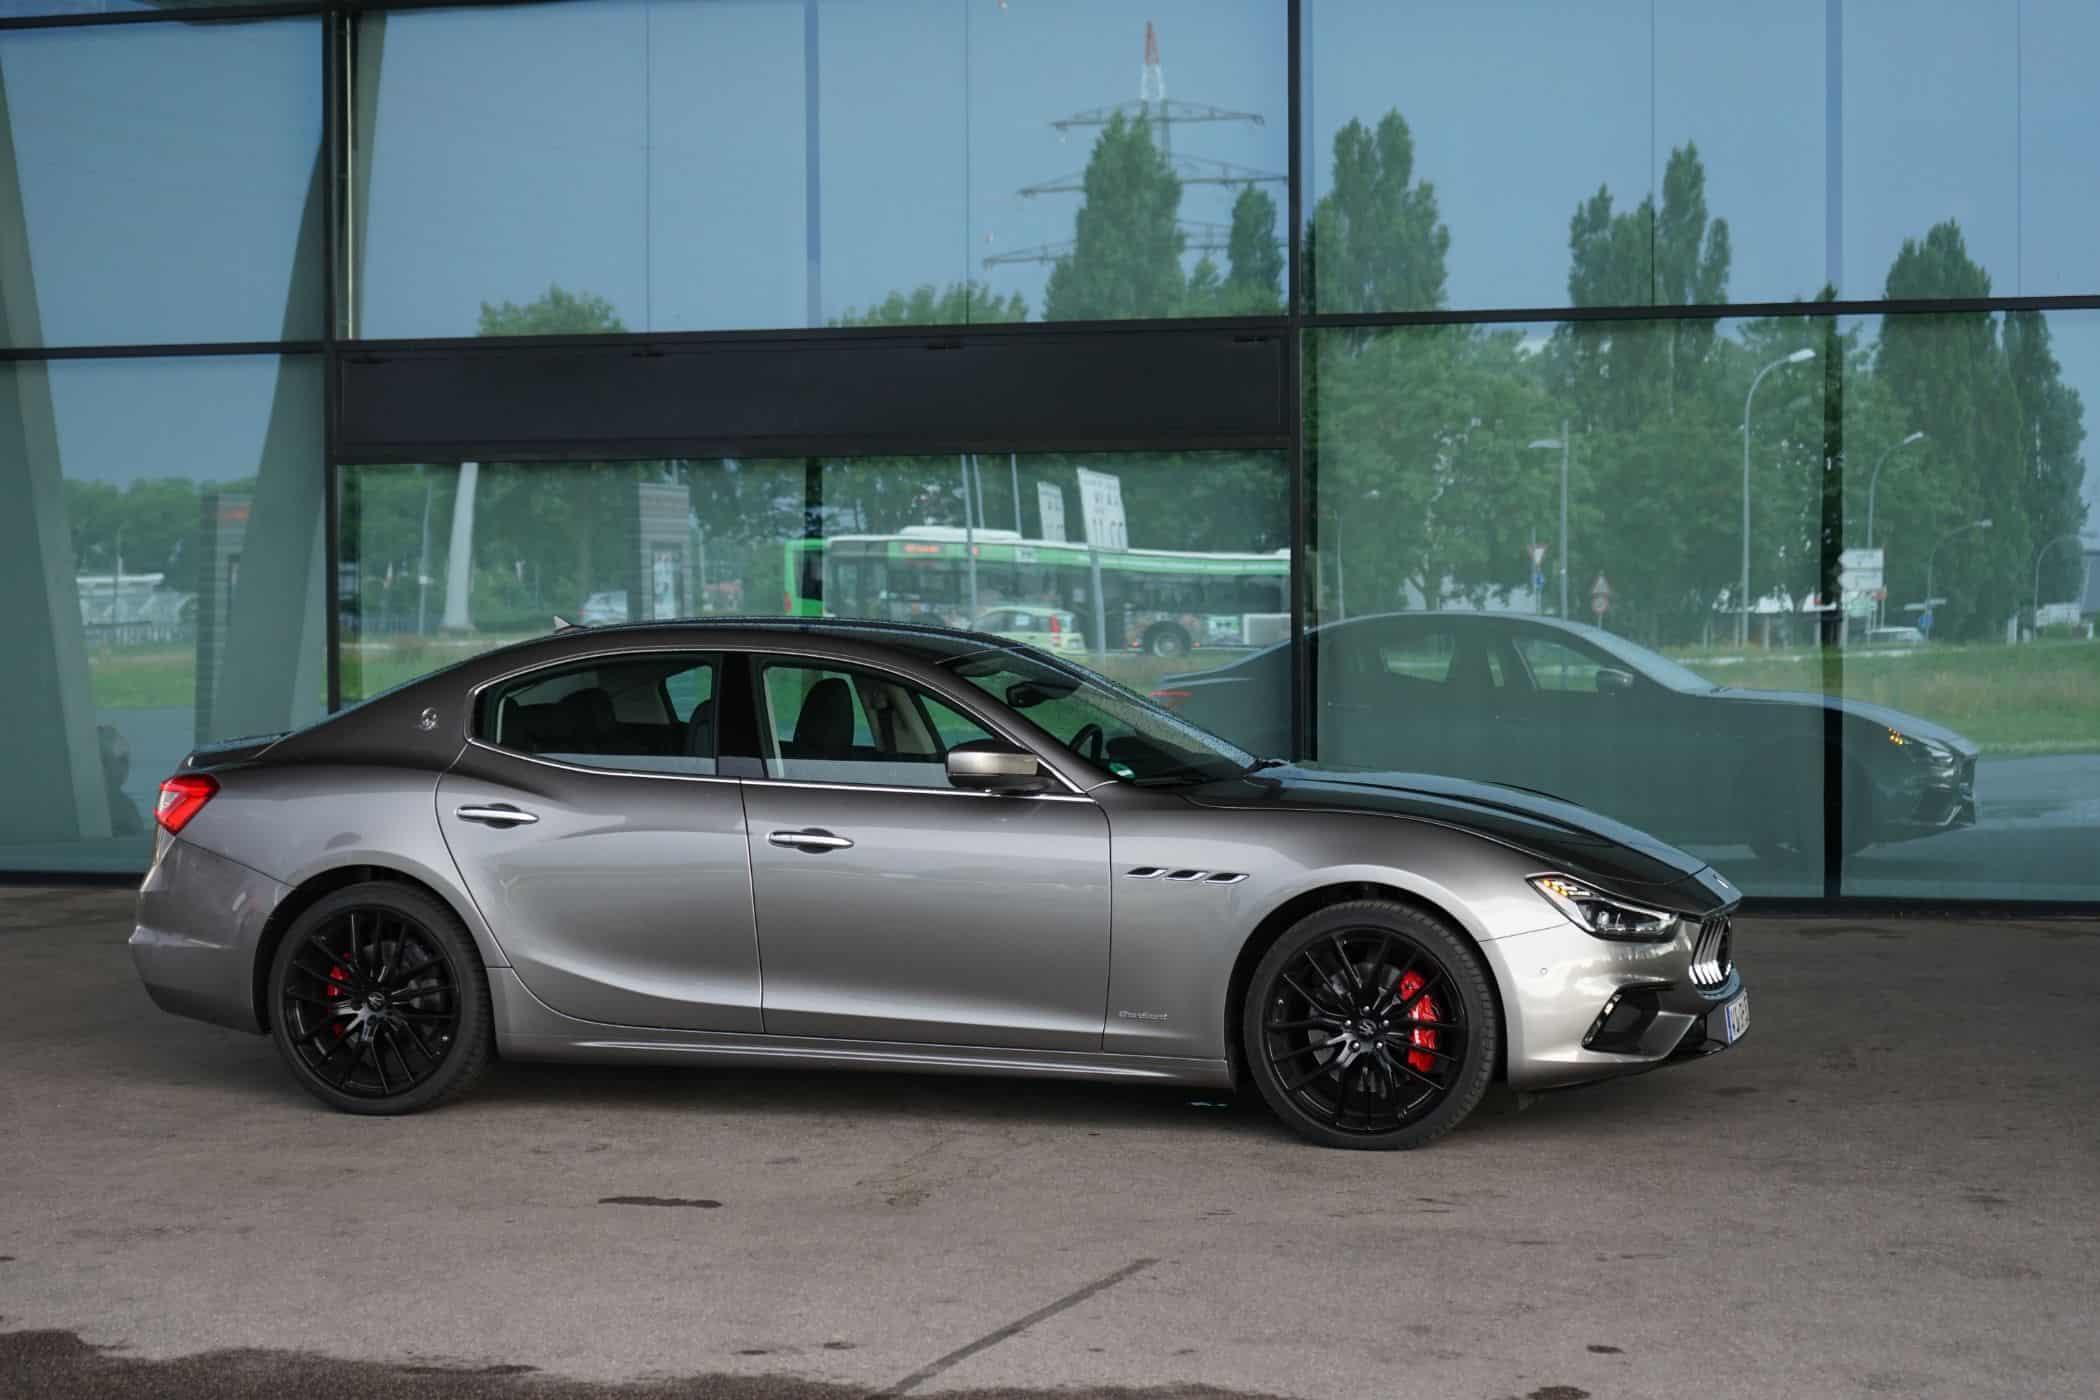 2020 Maserati Ghibli Gran Sport (350 PS) I Lohnt sich das Warten auf den Ghibli Hybrid?